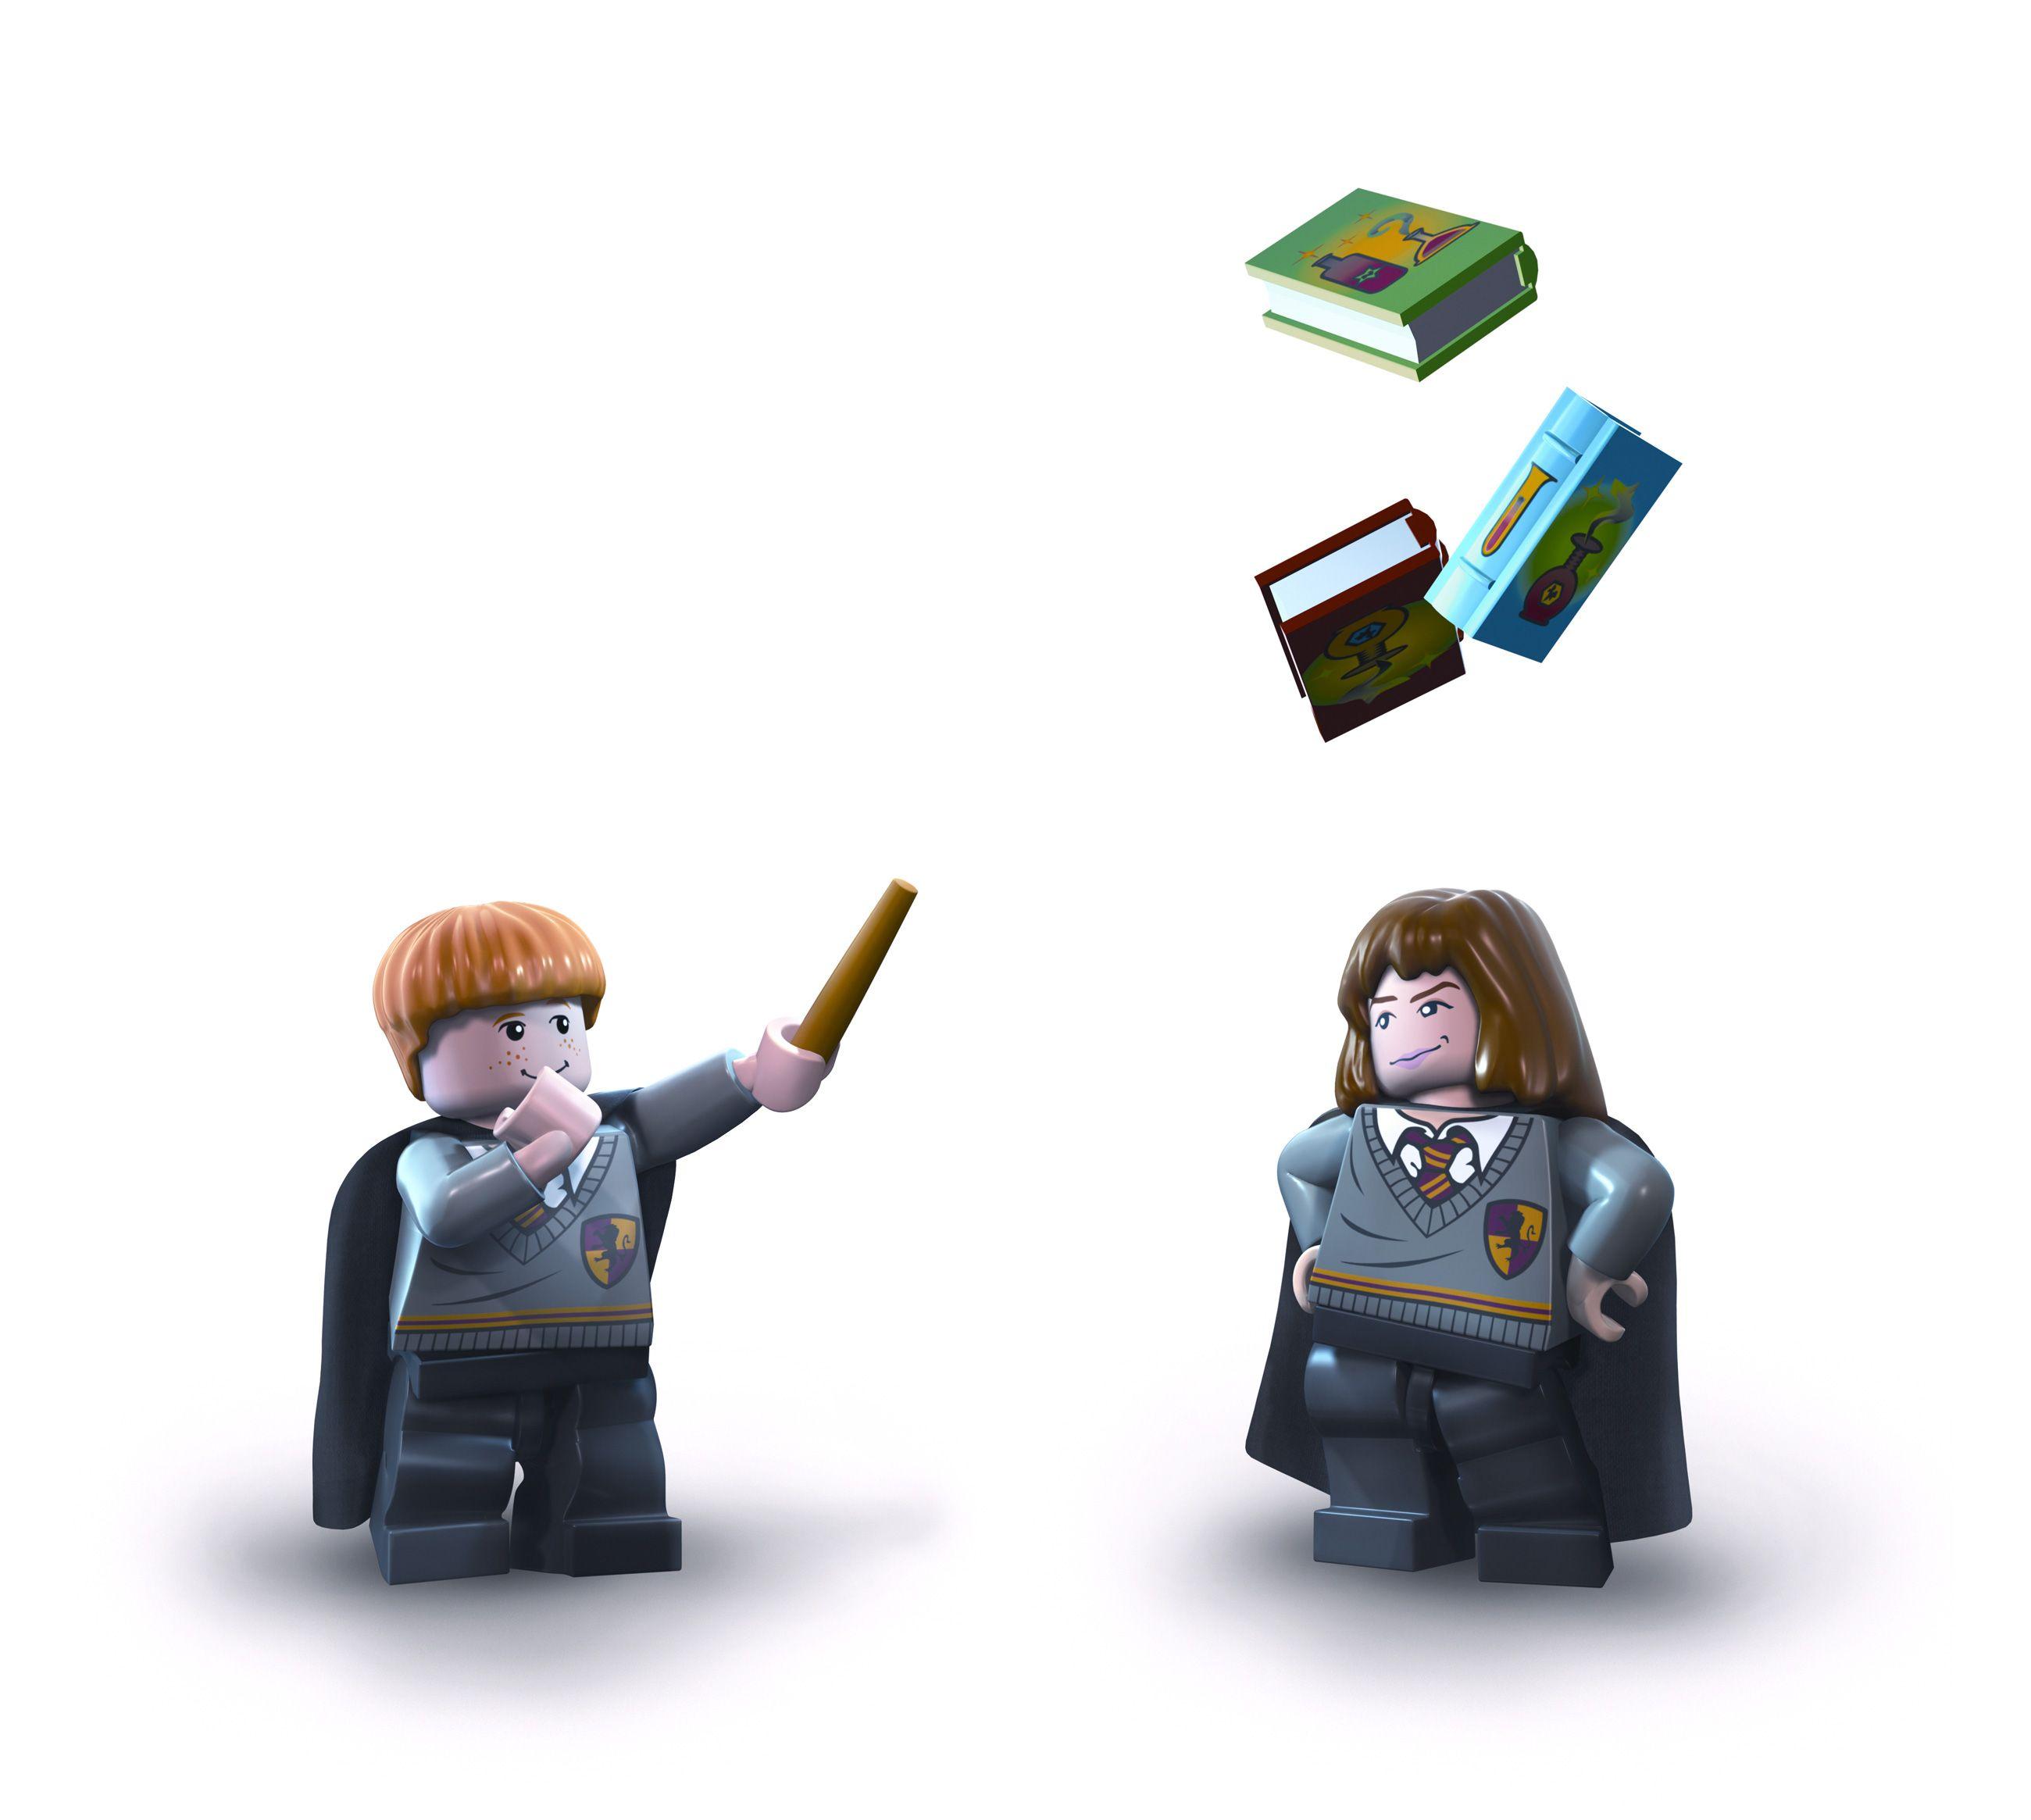 Lego Harry Potter Walkthrough Video Guide Wii Xbox 360 Ps3 Pc Lego Harry Potter Harry Potter Obsession Harry Potter Love